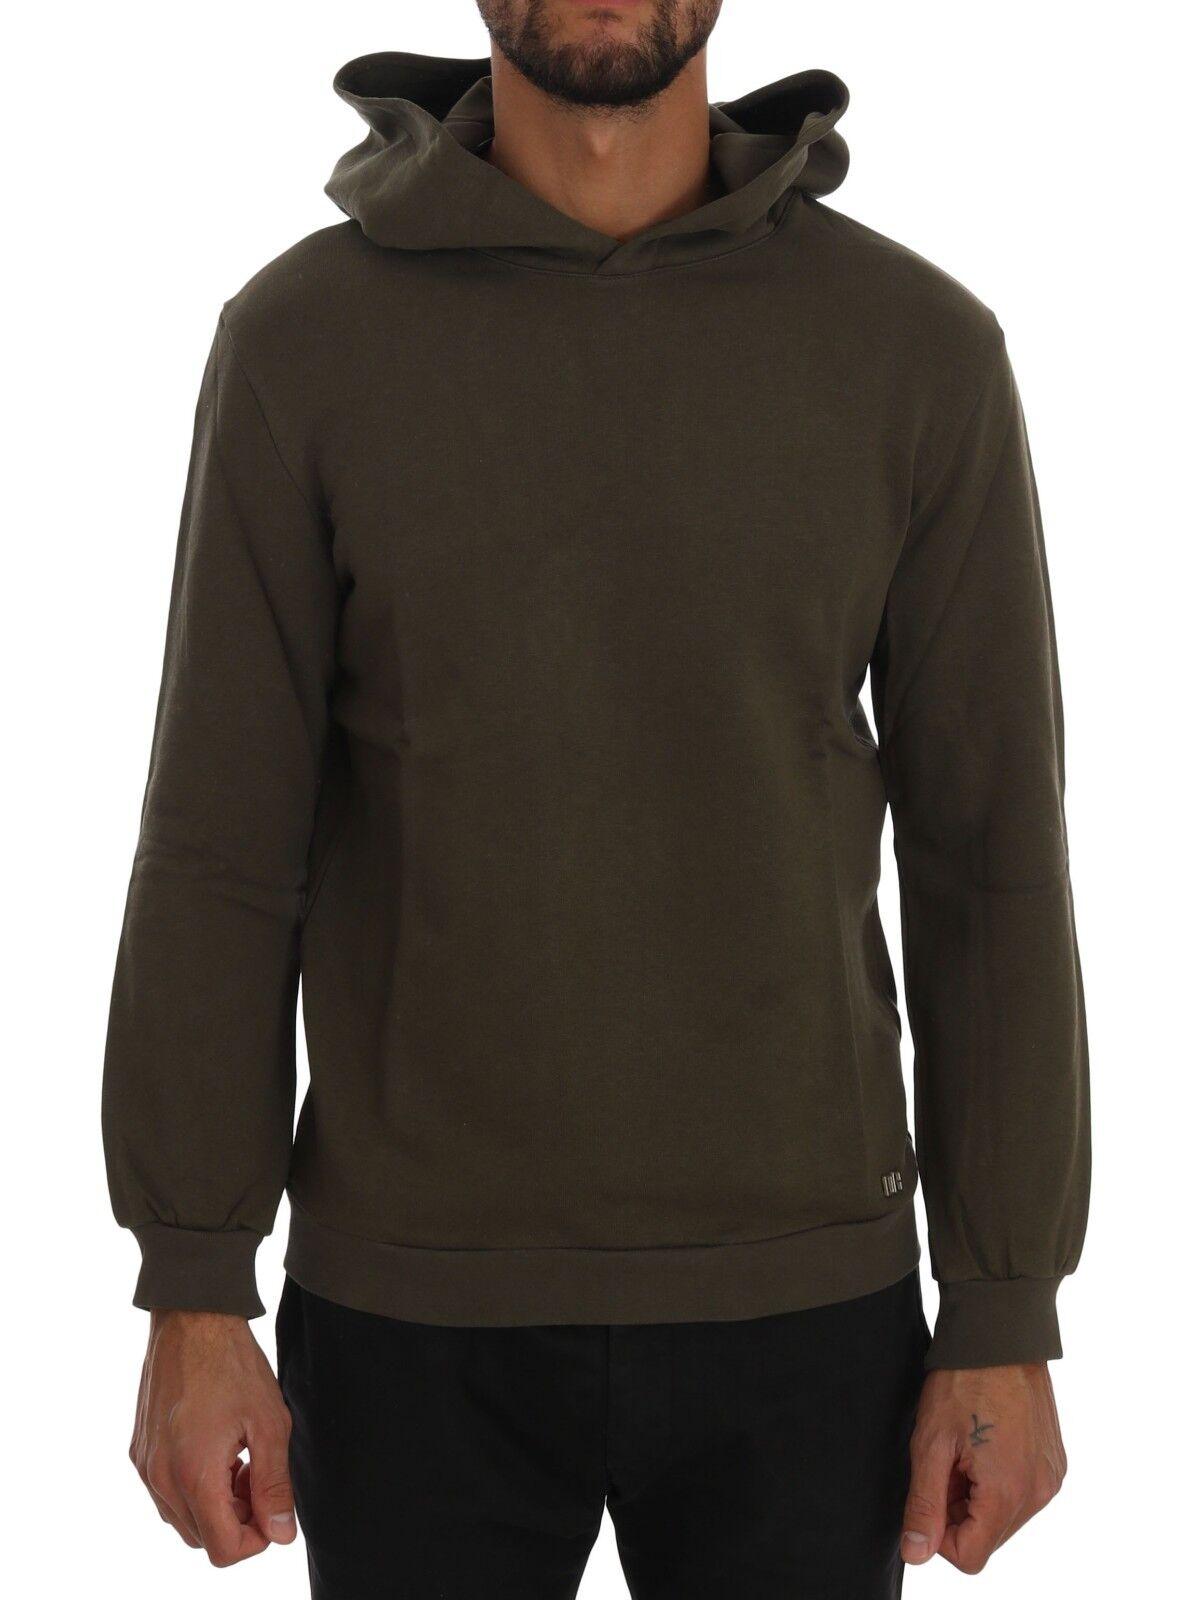 NEW 200 DANIELE ALESSANDRINI Sweater Grün Pullover Hodded Cotton  Herren s. XL